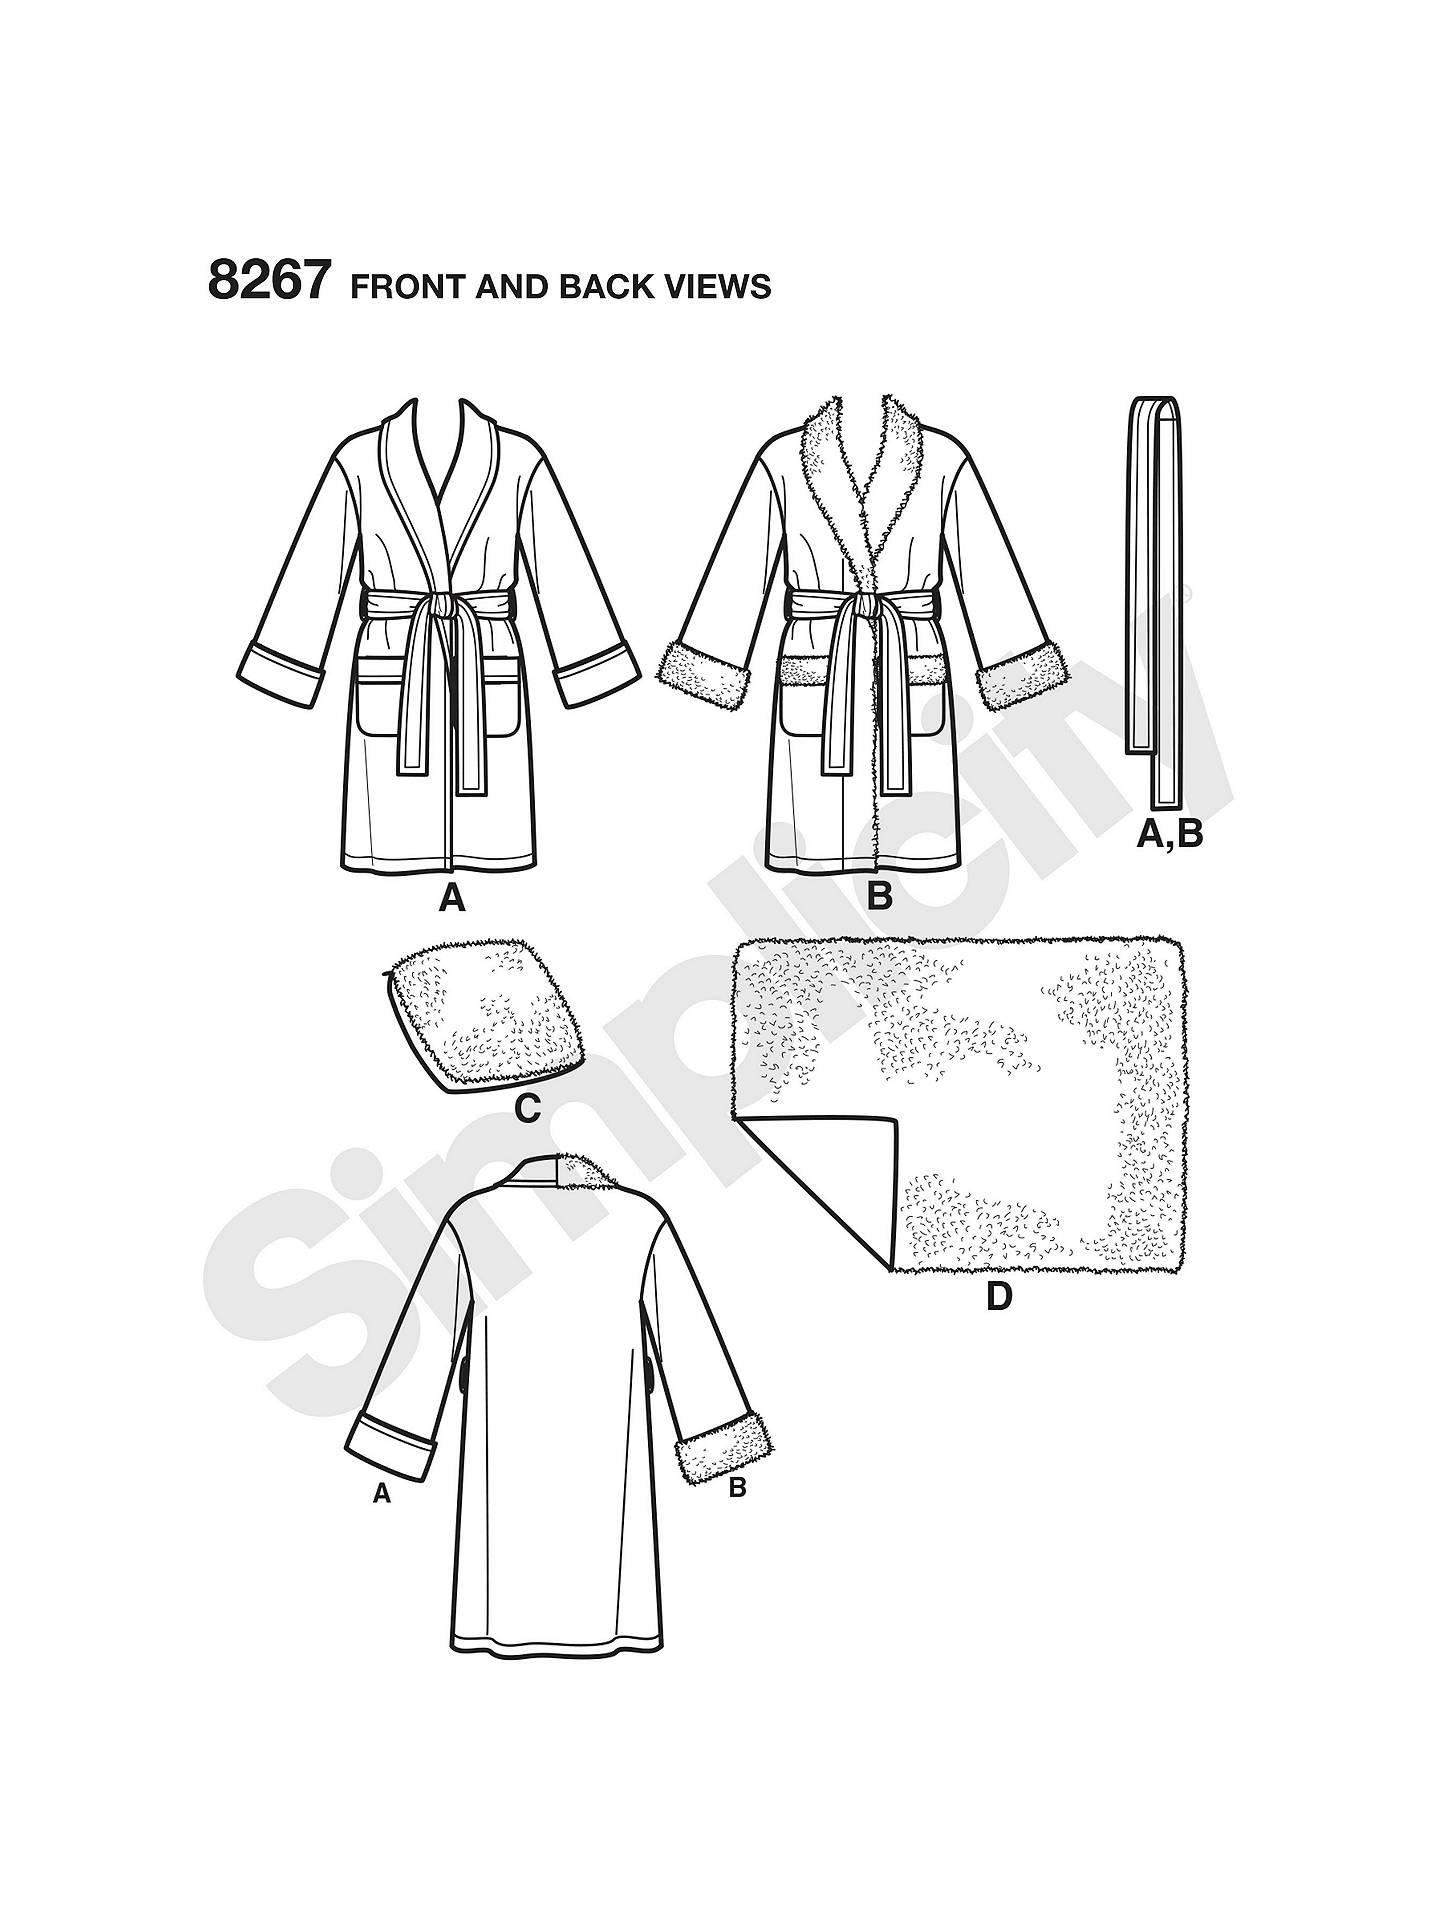 33225bdd3a ... BuySimplicity Unisex Robes